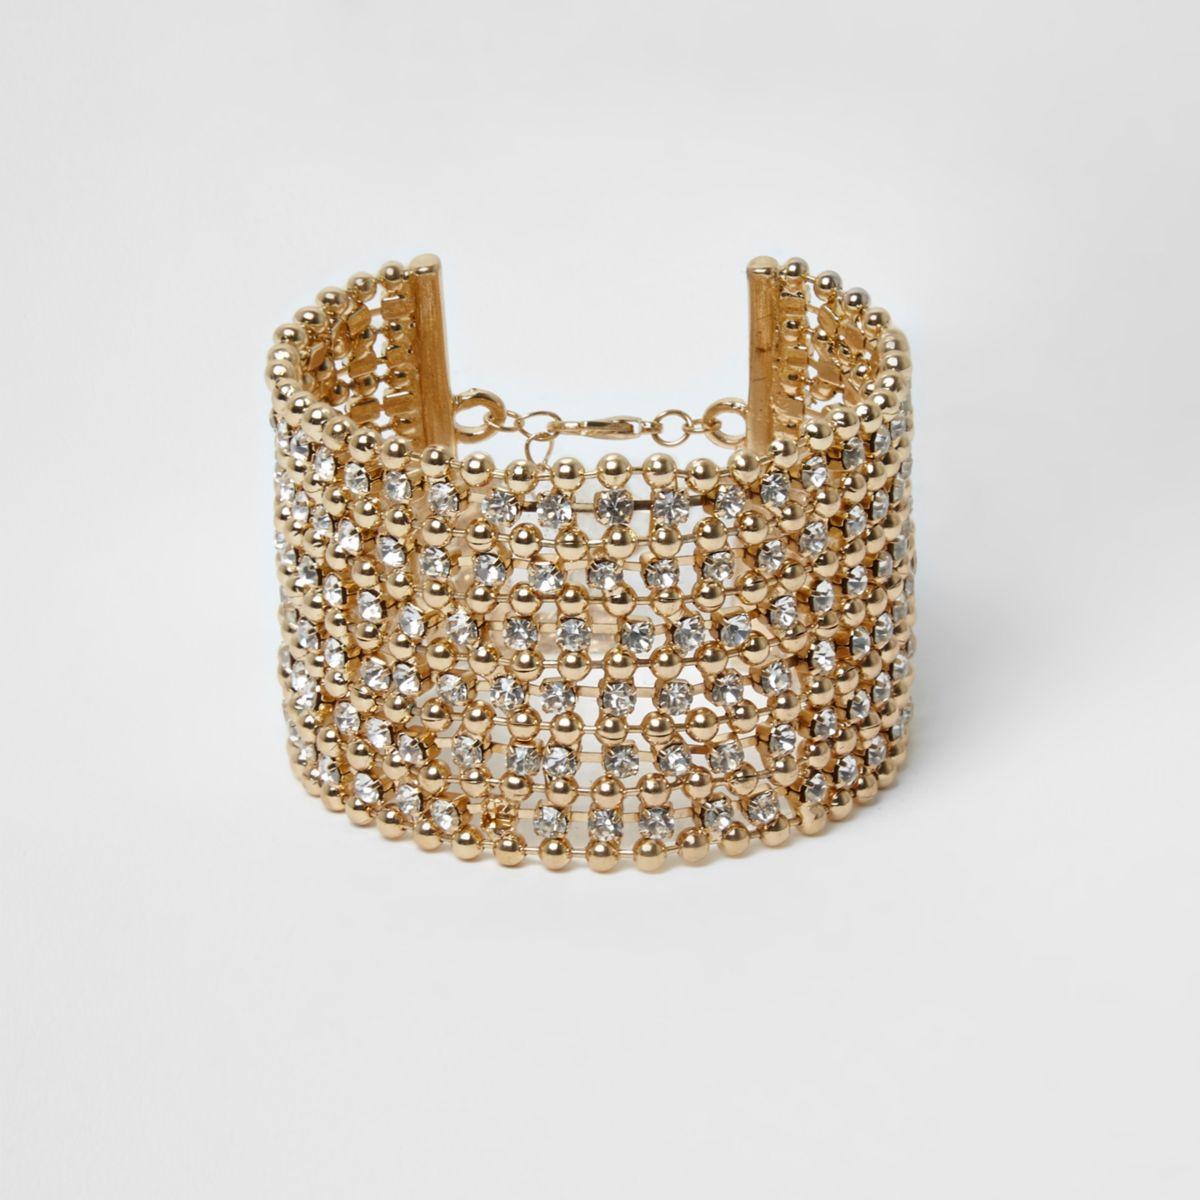 Gold tone bead and rhinestone cuff bracelet